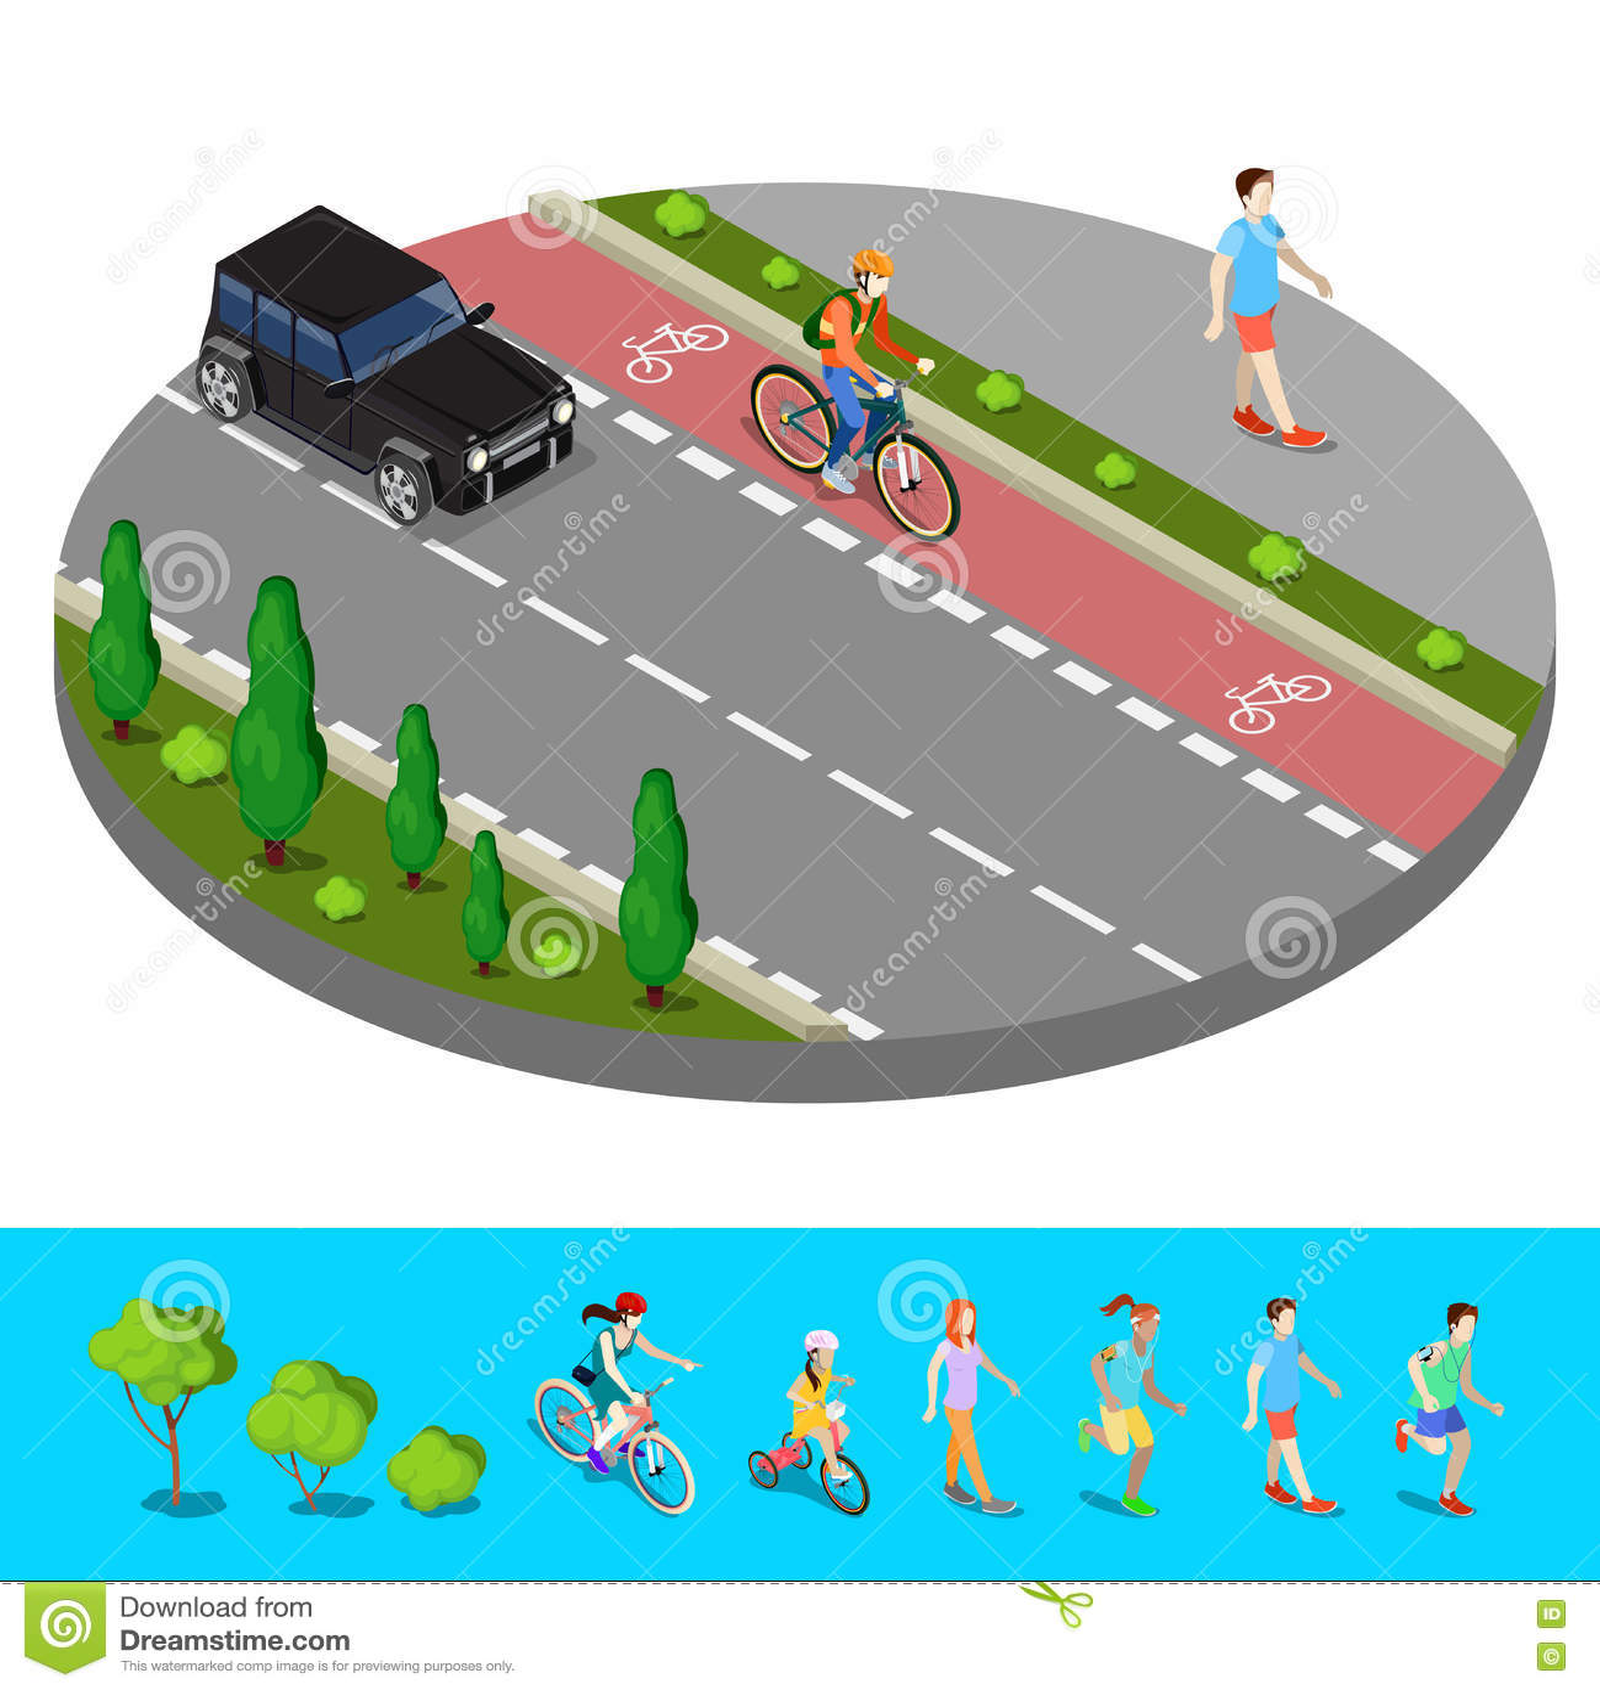 Isometric πόλη Πορεία ποδηλάτων με το μονοπάτι Bicyclist με το περπατώντας άτομο